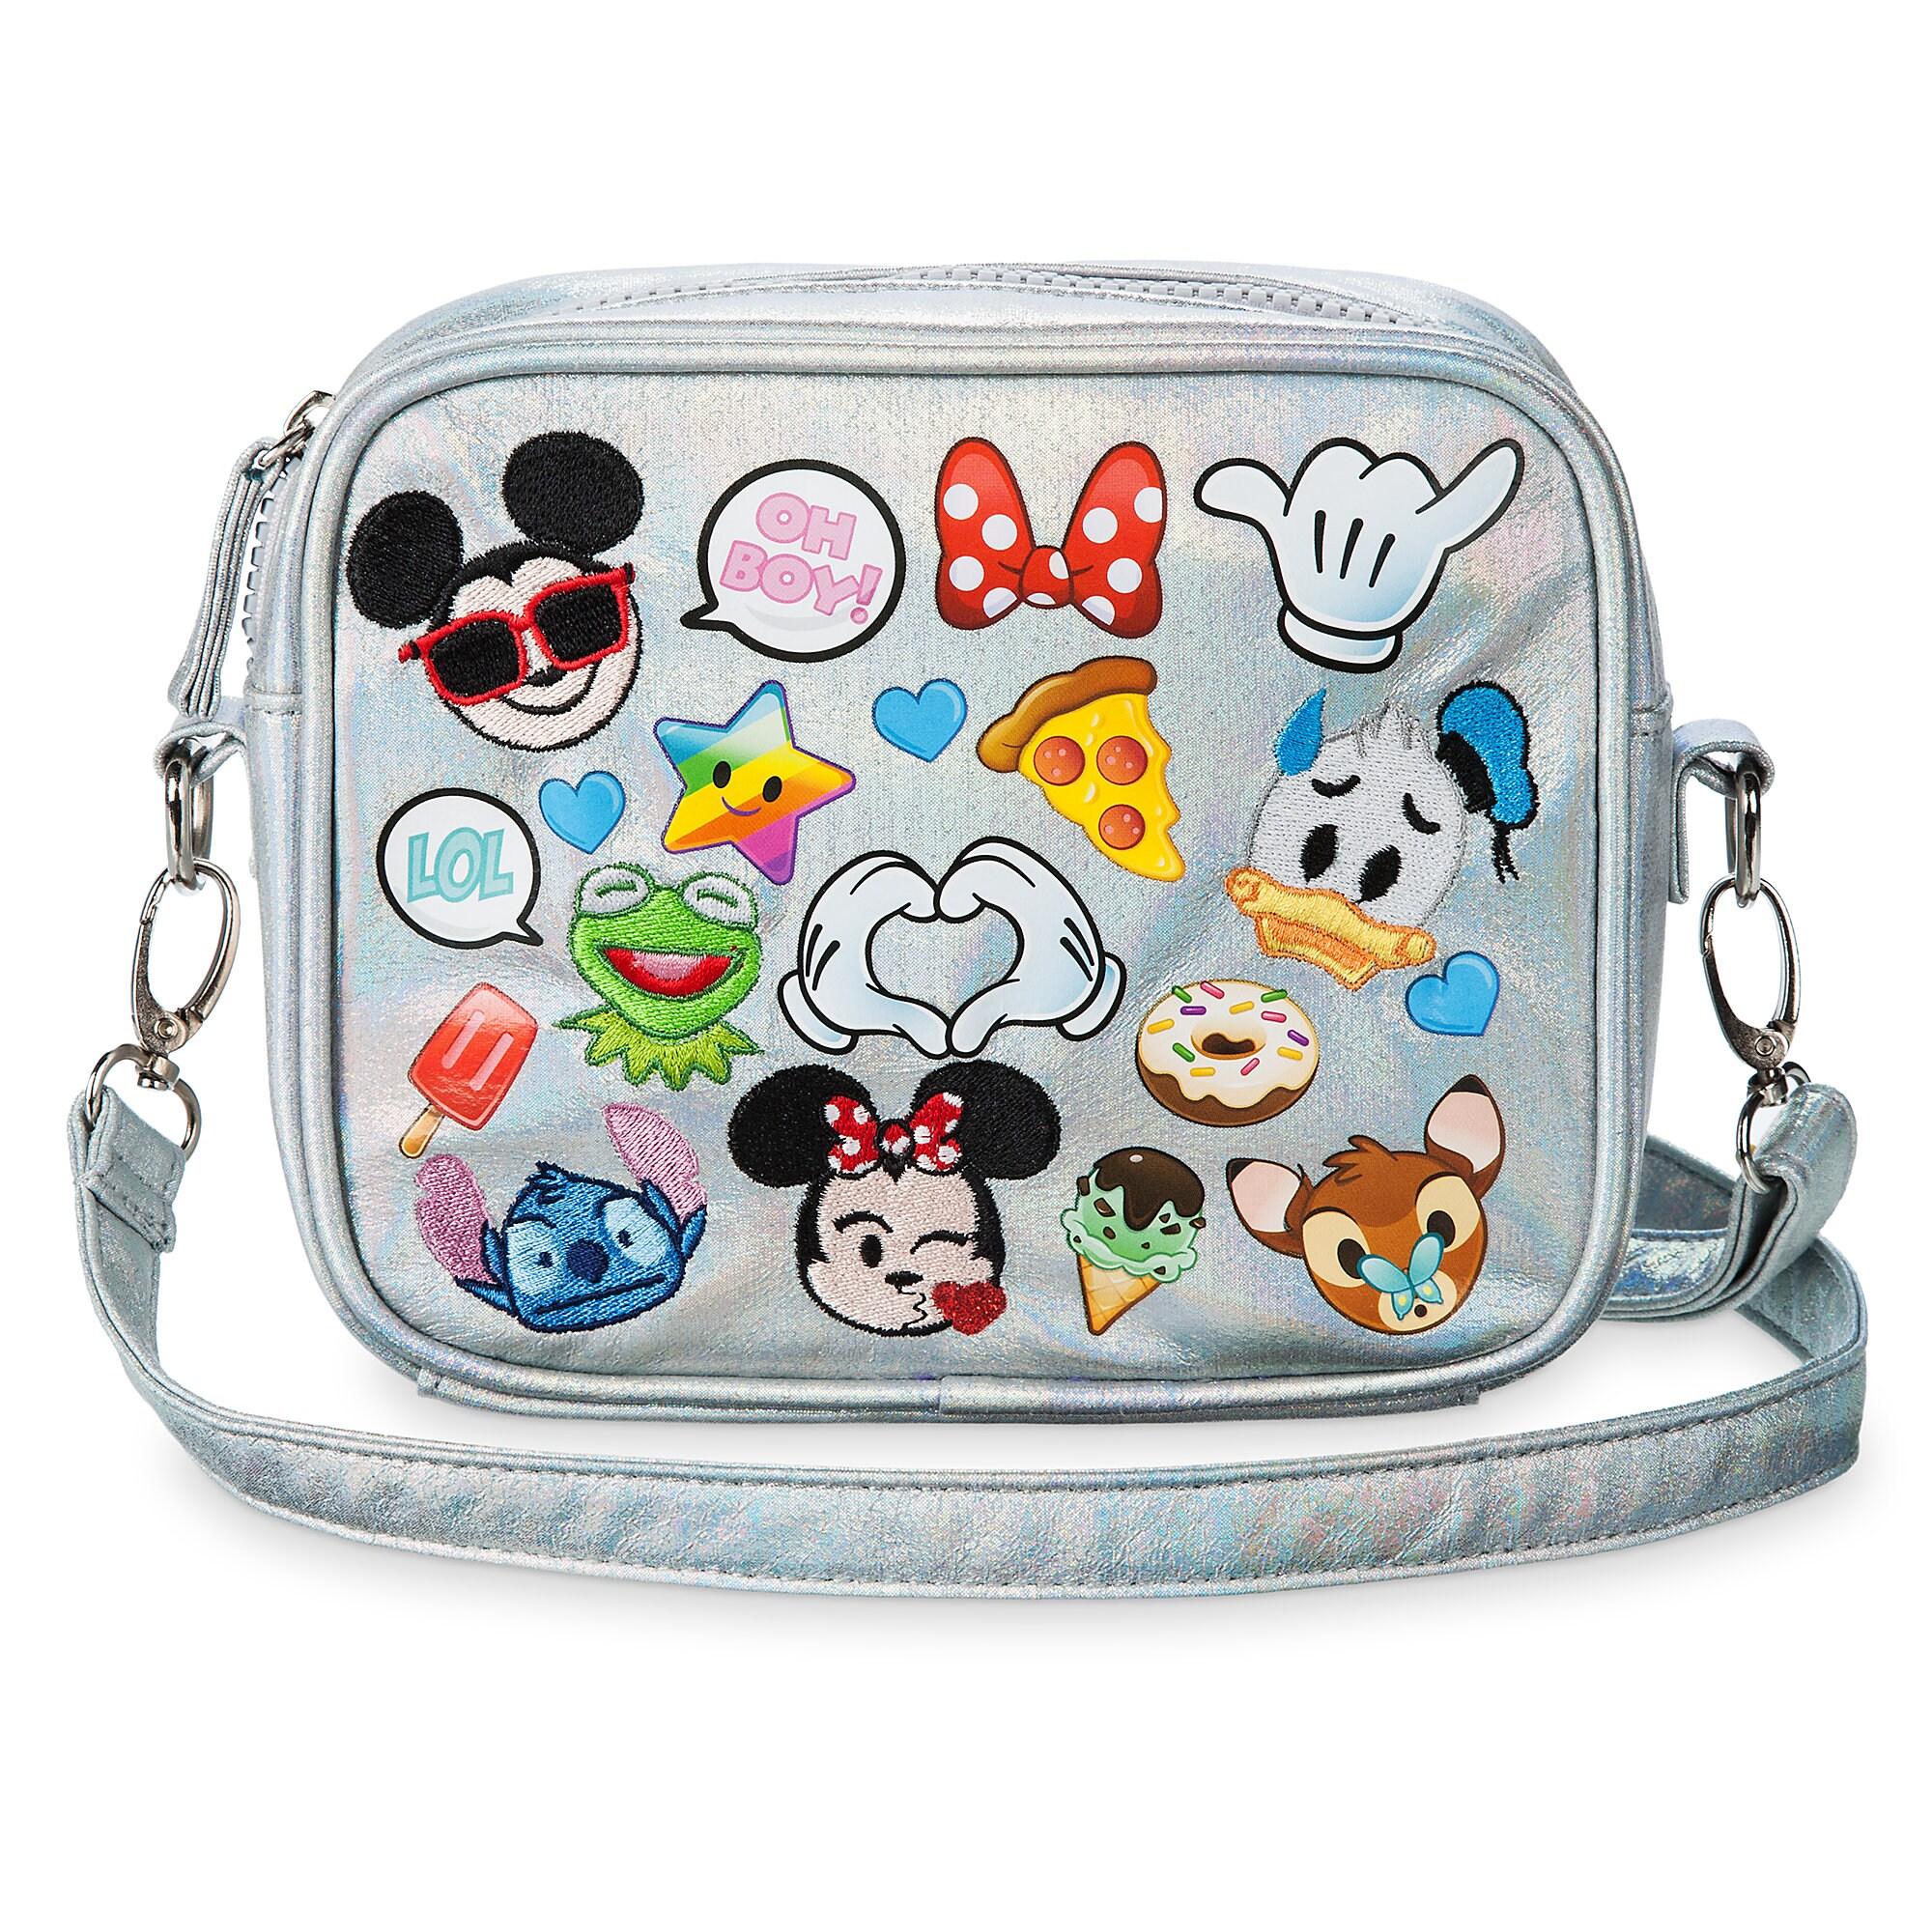 Disney Emoji Crossbody Bag for Girls